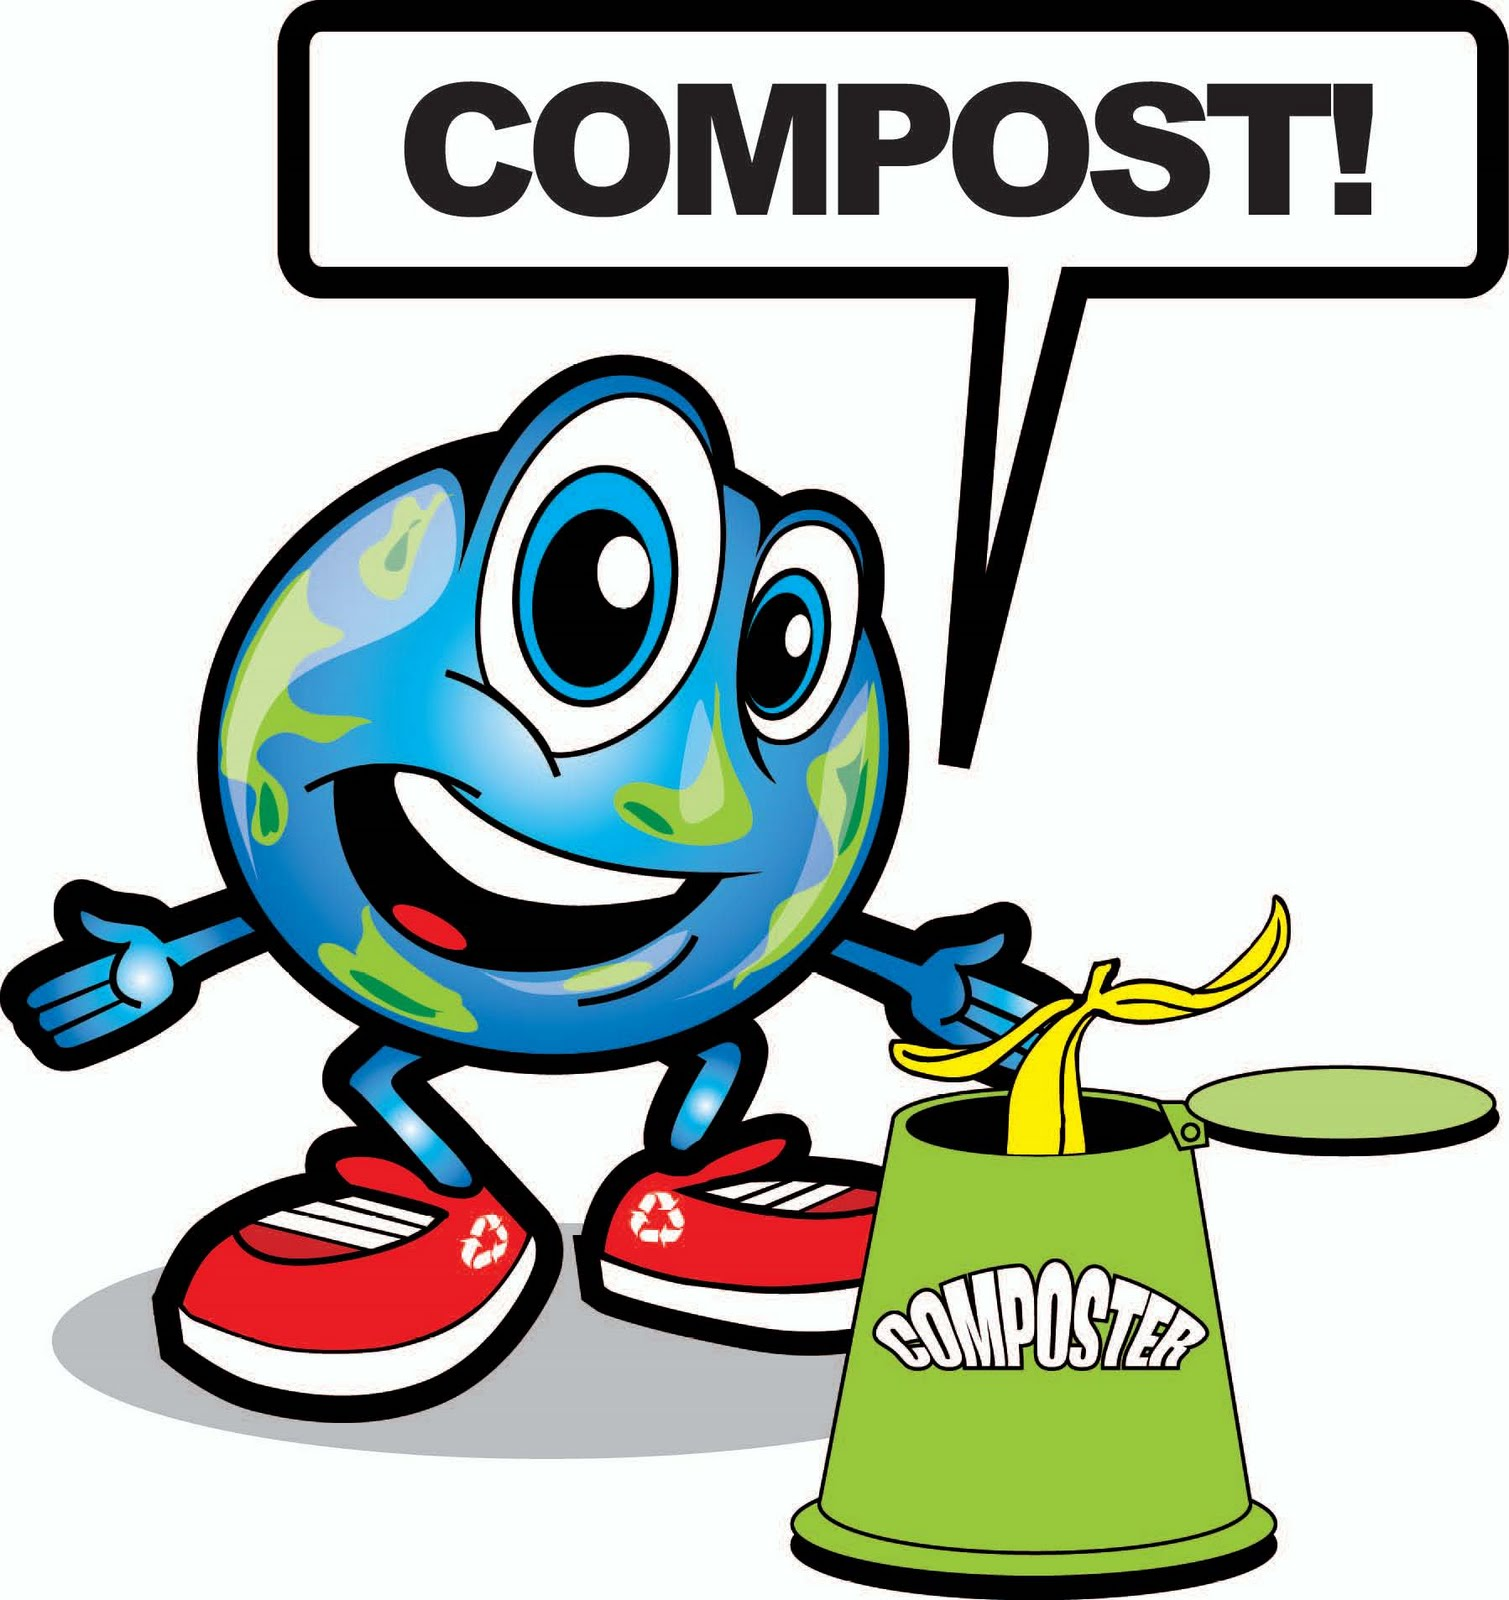 ILMU PENGETAHUAN ALAM: Manfaat Kompos